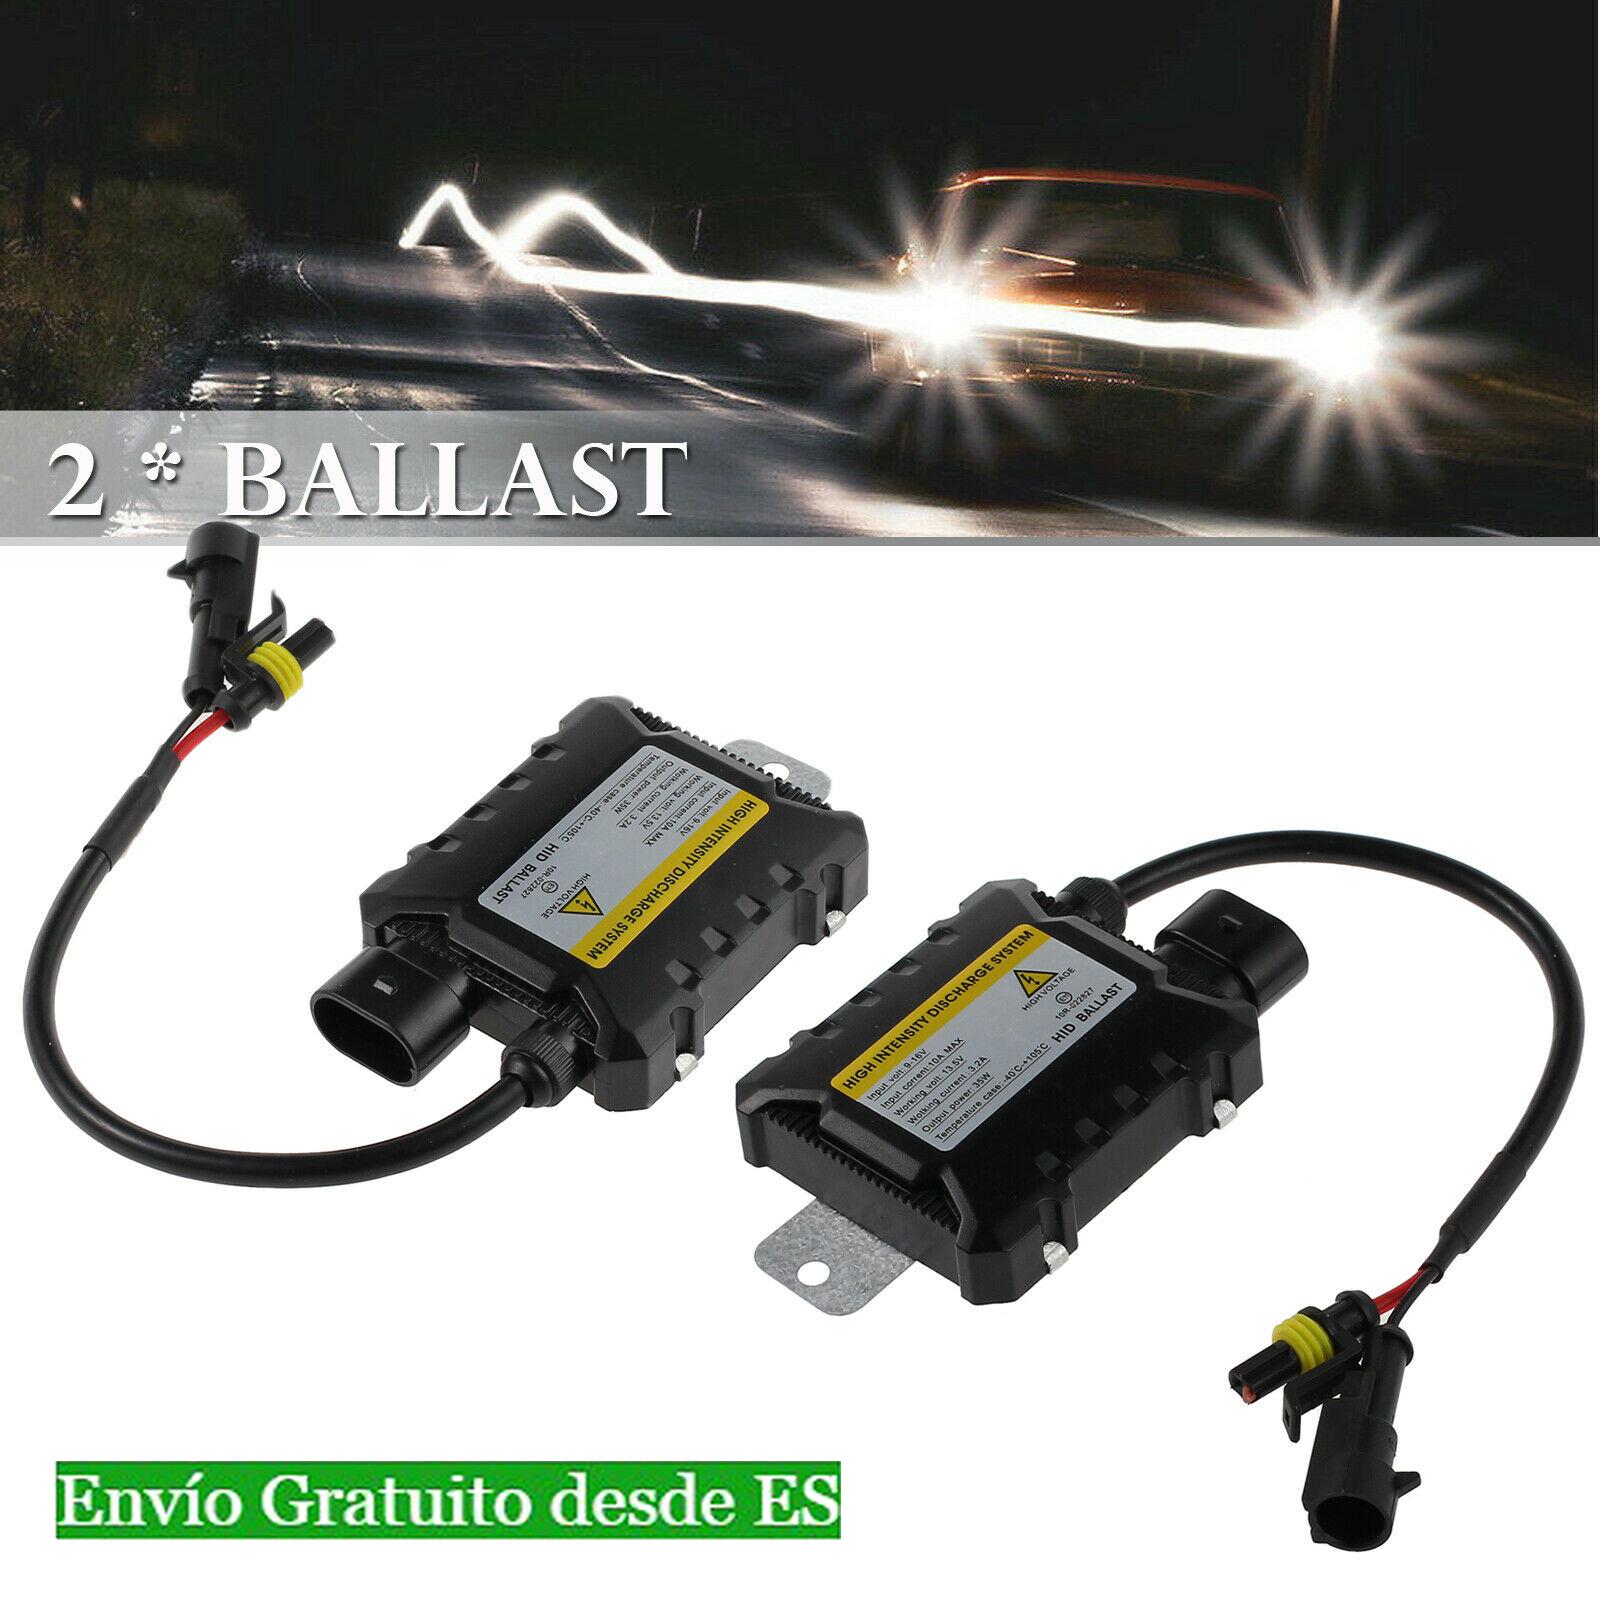 BALASTRO CAN BUS PARA BOMBILLAS DE XENON DS2 Y D2R 35W 12V.ENVIO GRATIS 24H